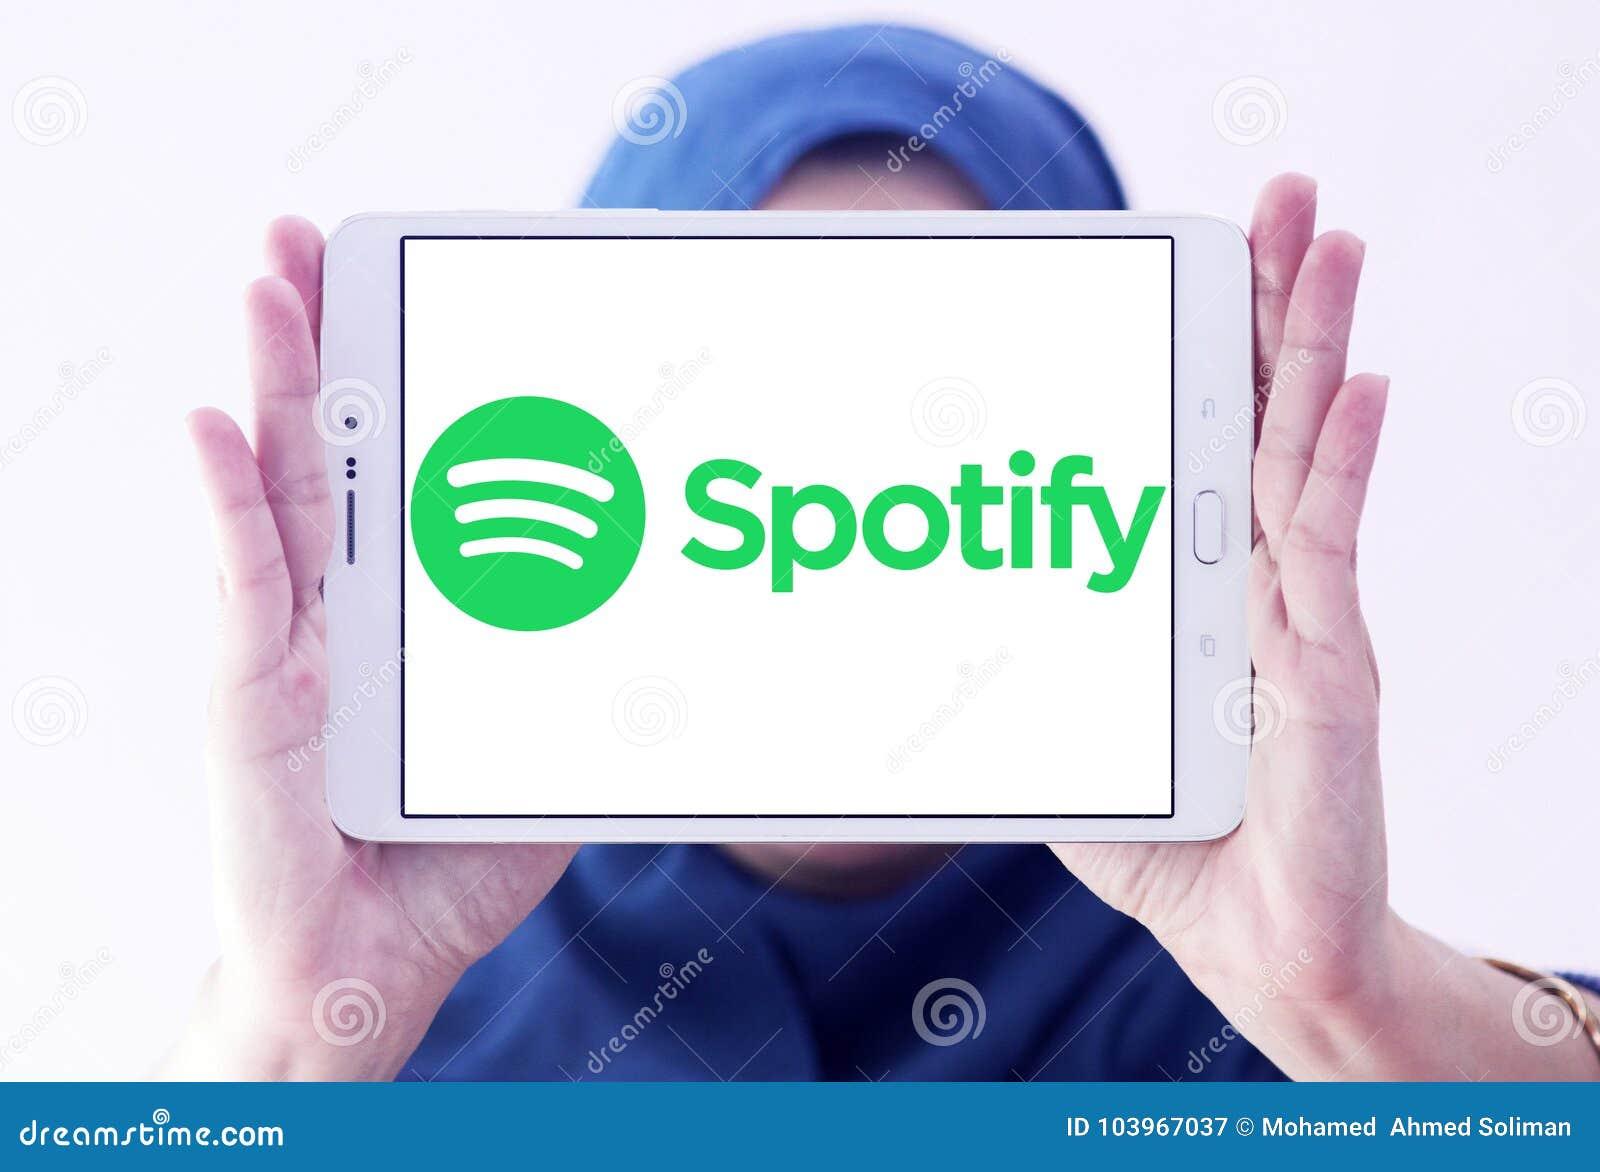 Spotify Logo Editorial Photography Image Of Logotype 103967037